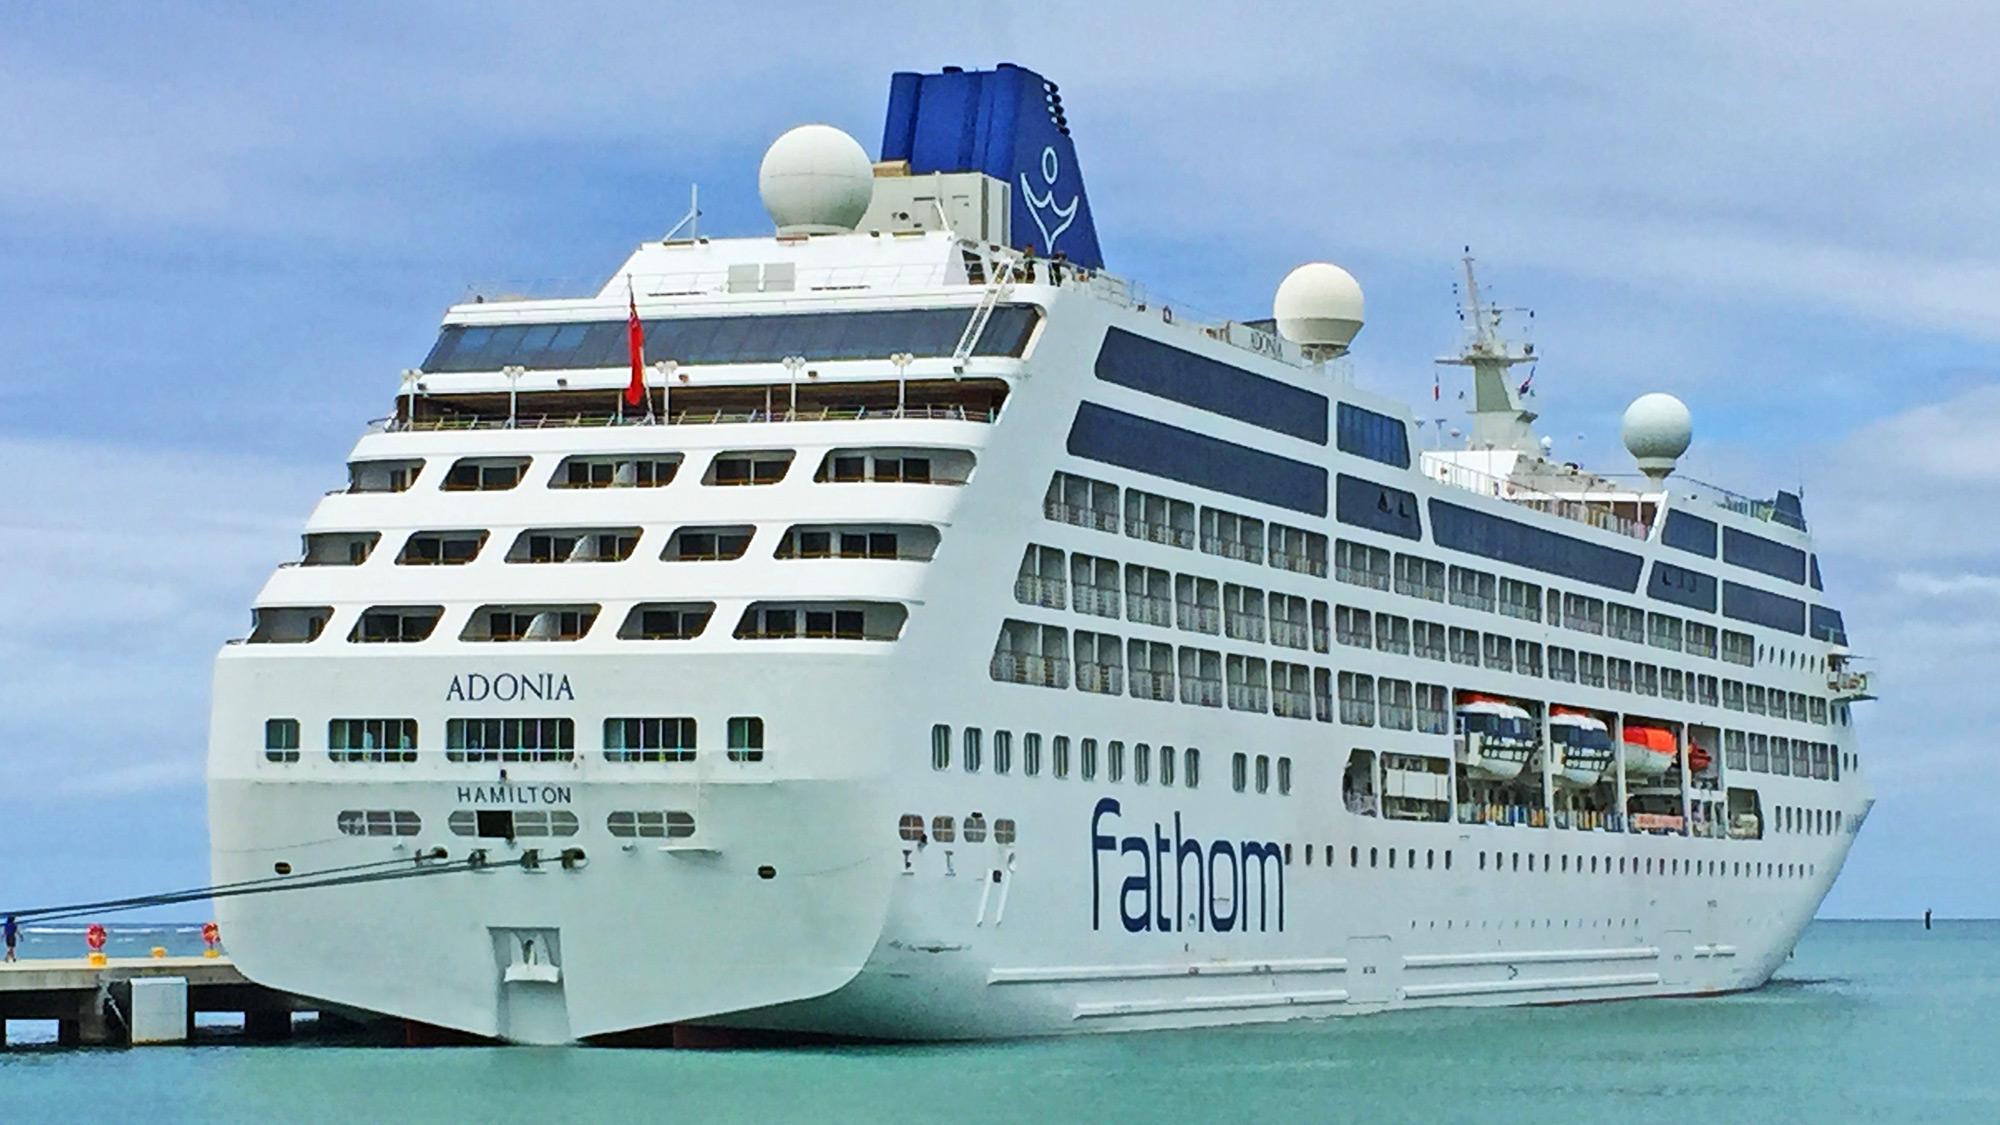 d75c0c17117d Fathom s Dominican Republic cruises to add Cuba call